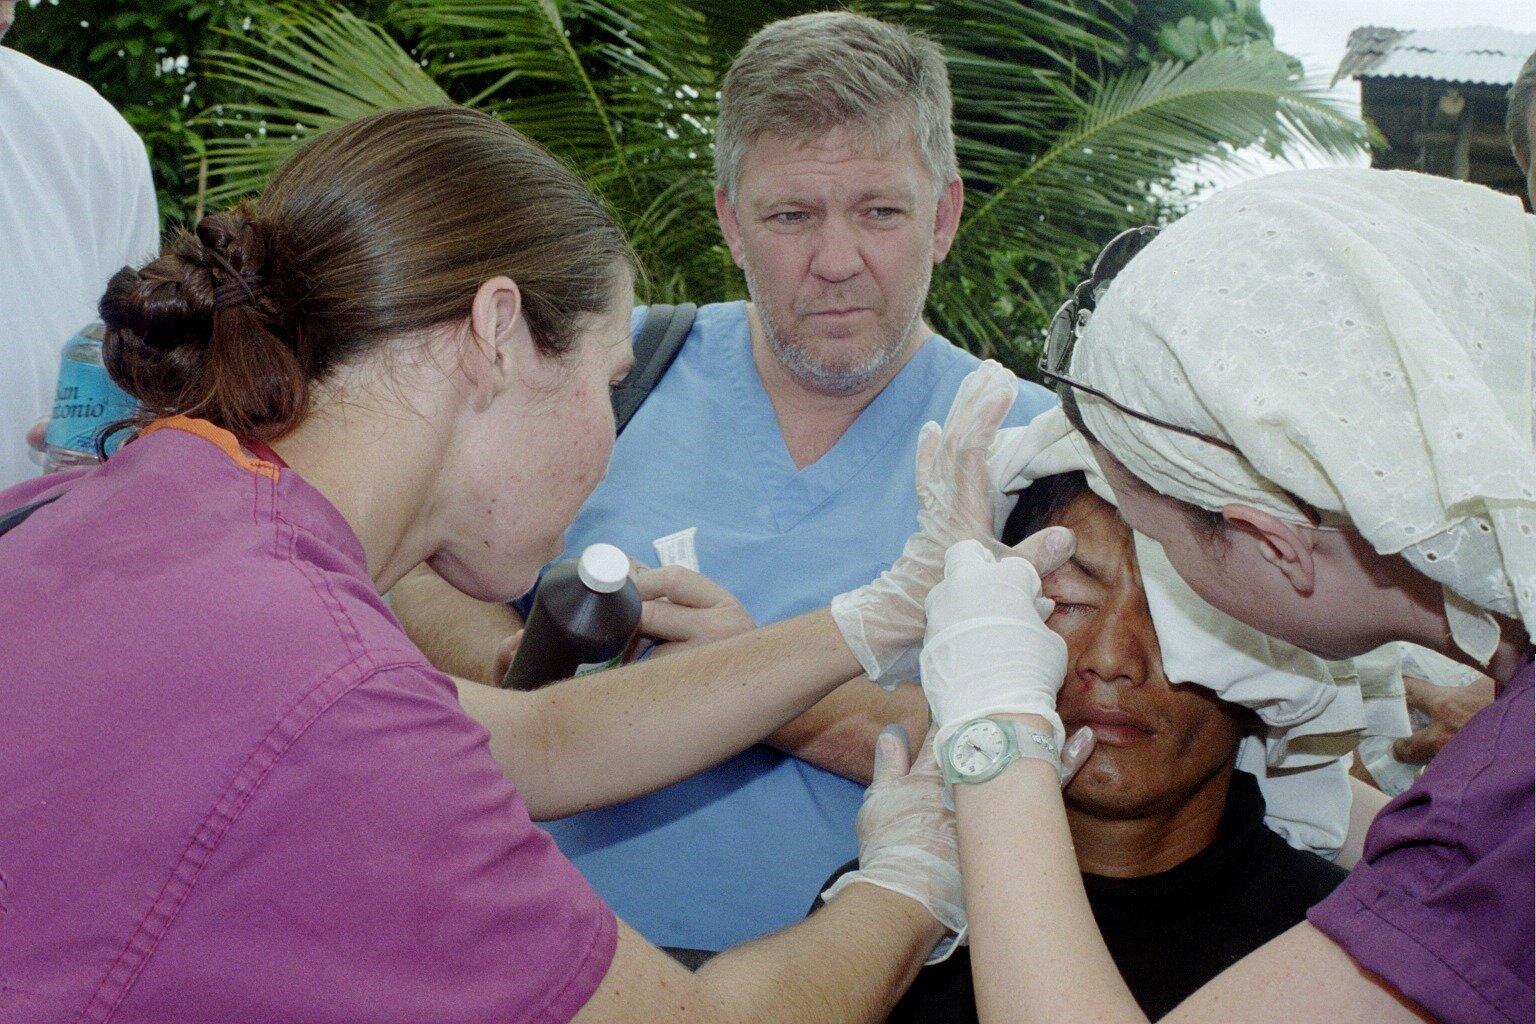 eye injury.JPG